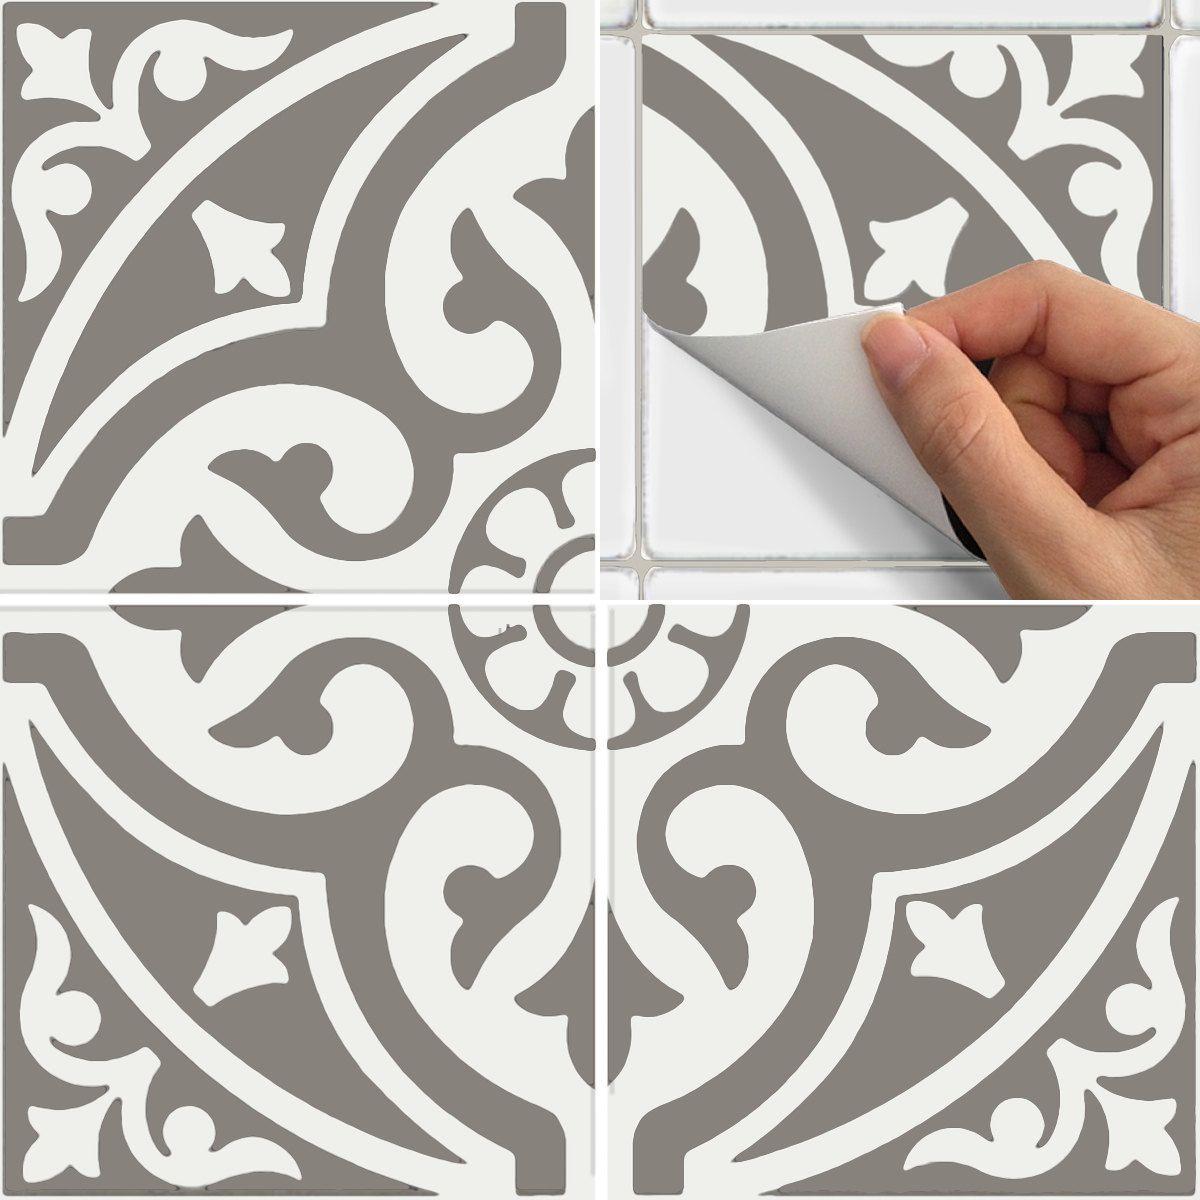 Tile sticker for kitchen bath floor wall waterproof - Stickers pour carrelage mural cuisine ...